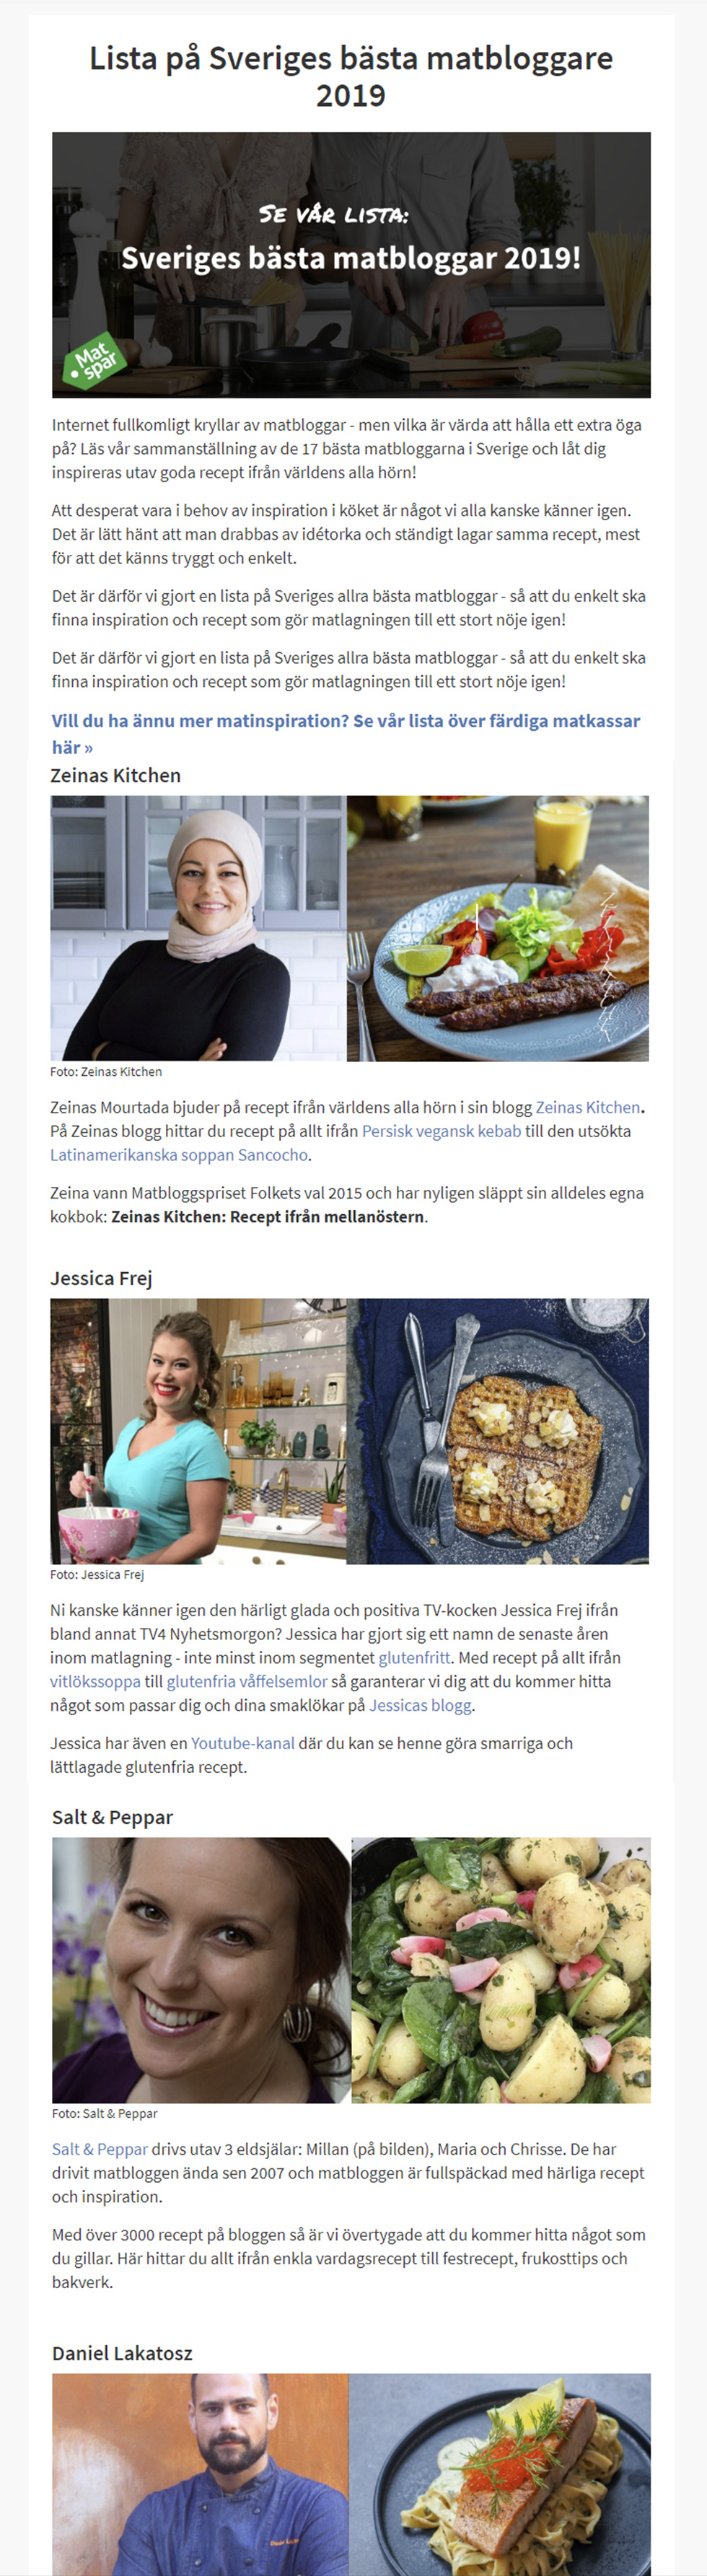 Matspar.se listar Sveriges bästa matbloggar 2019